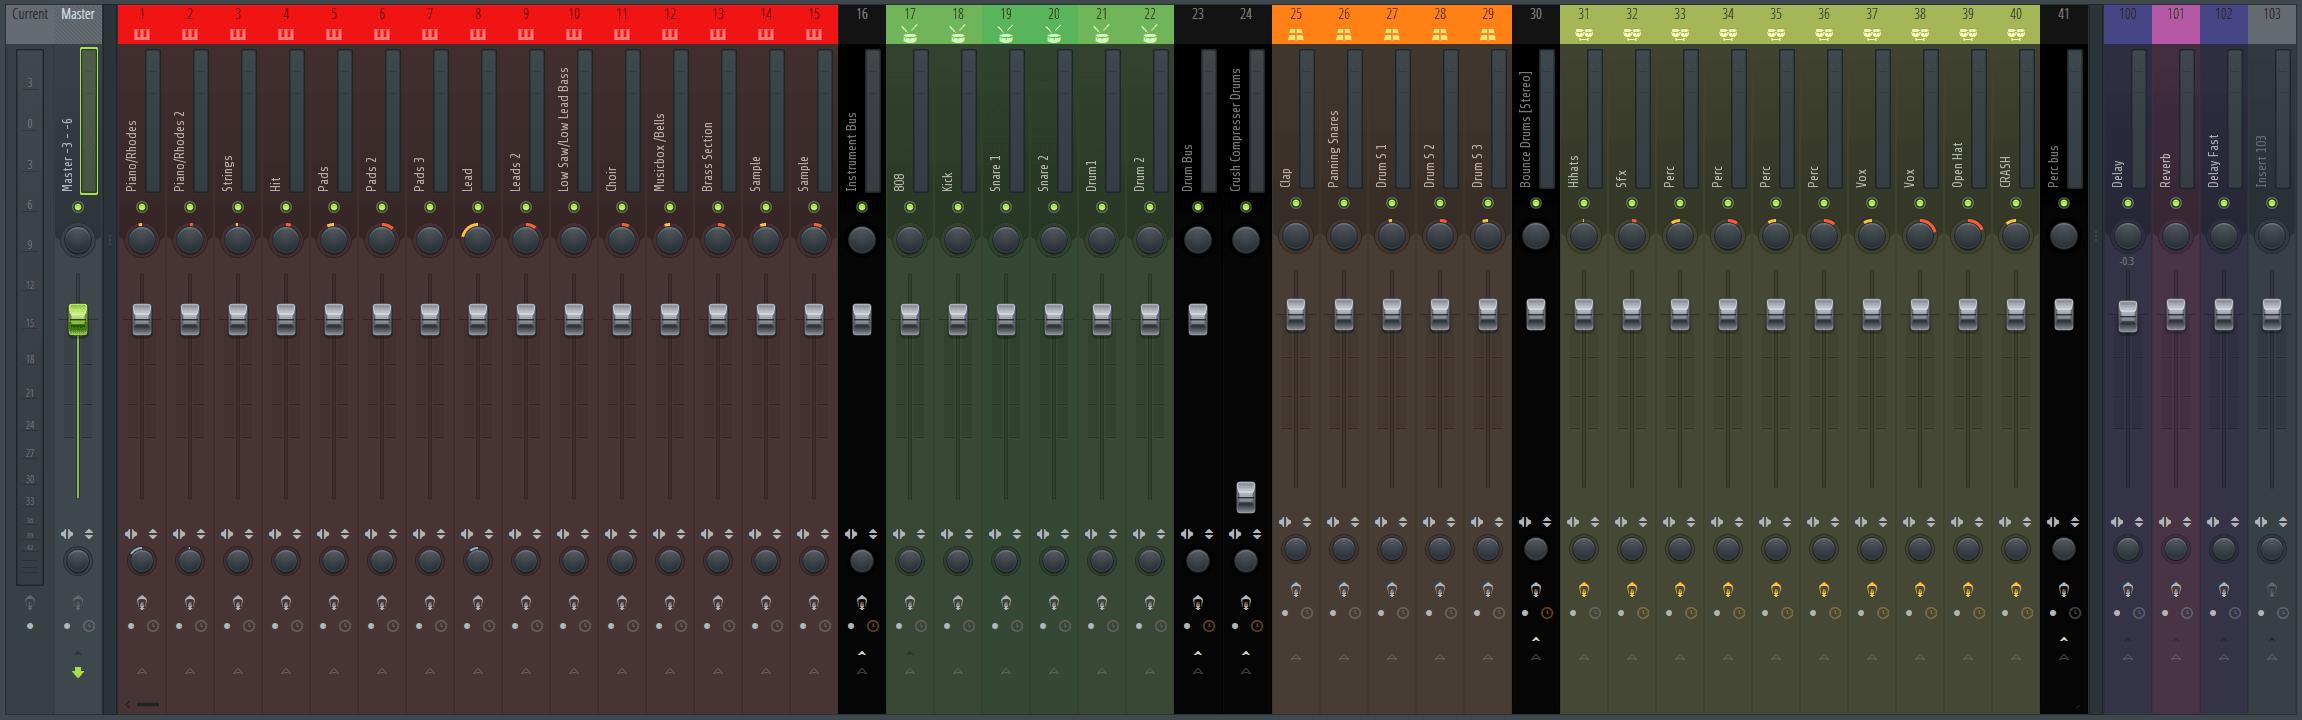 Fl Studio 12 Mixing Template 2